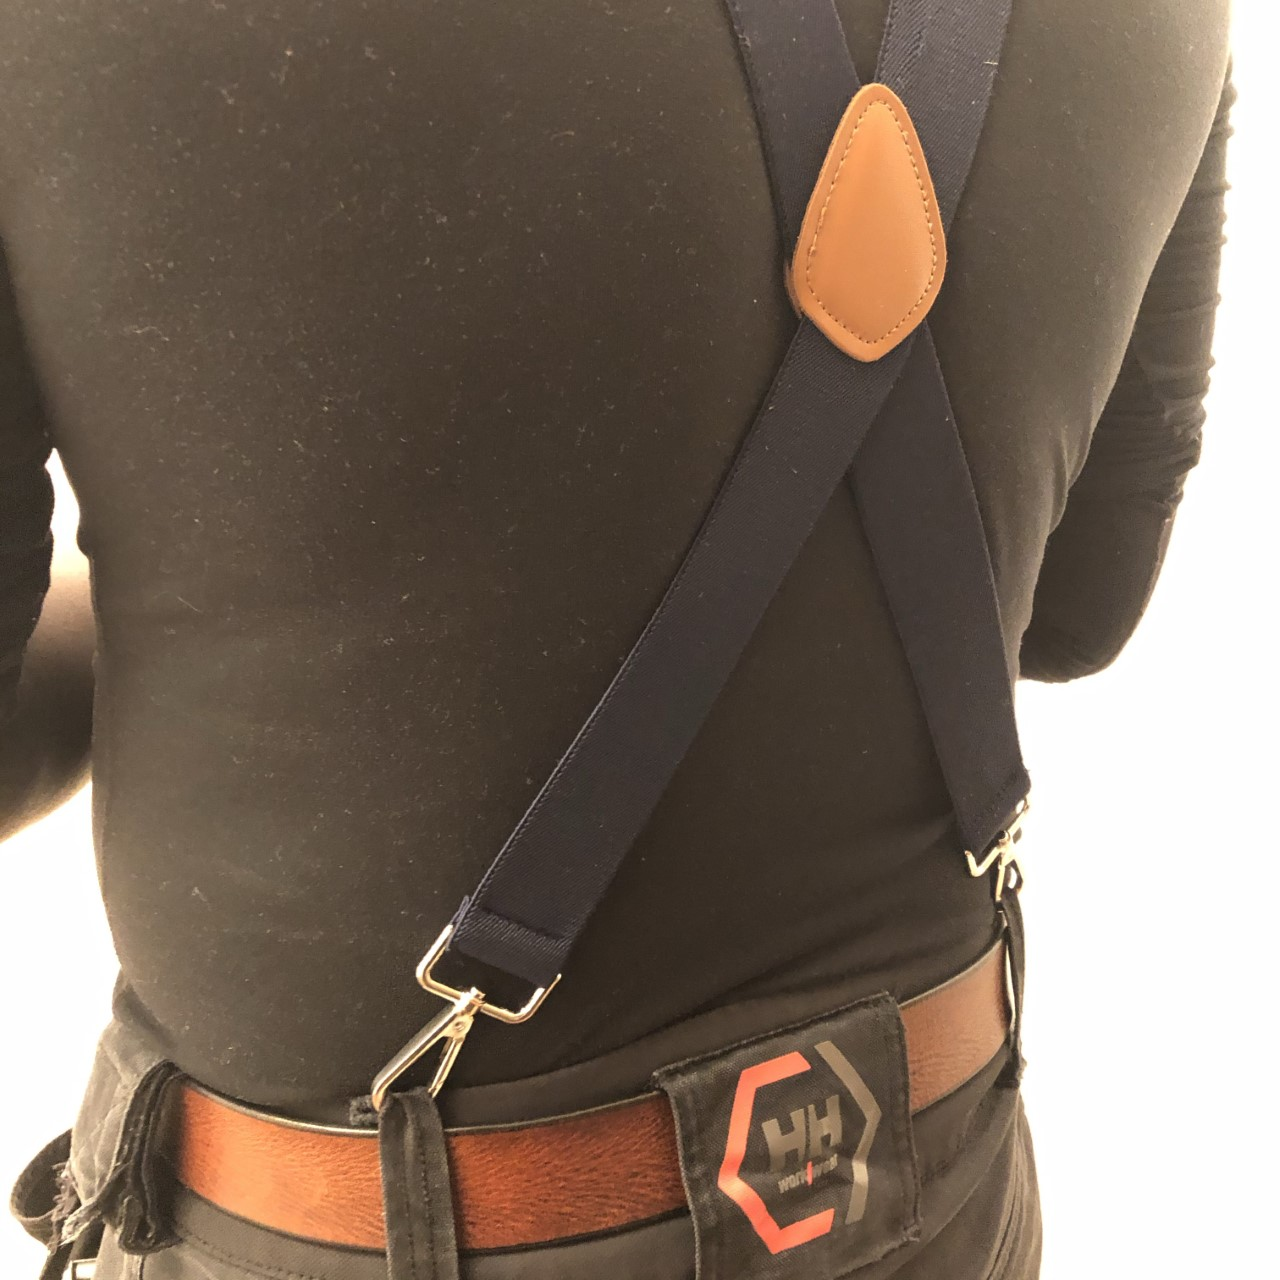 suspenders 2